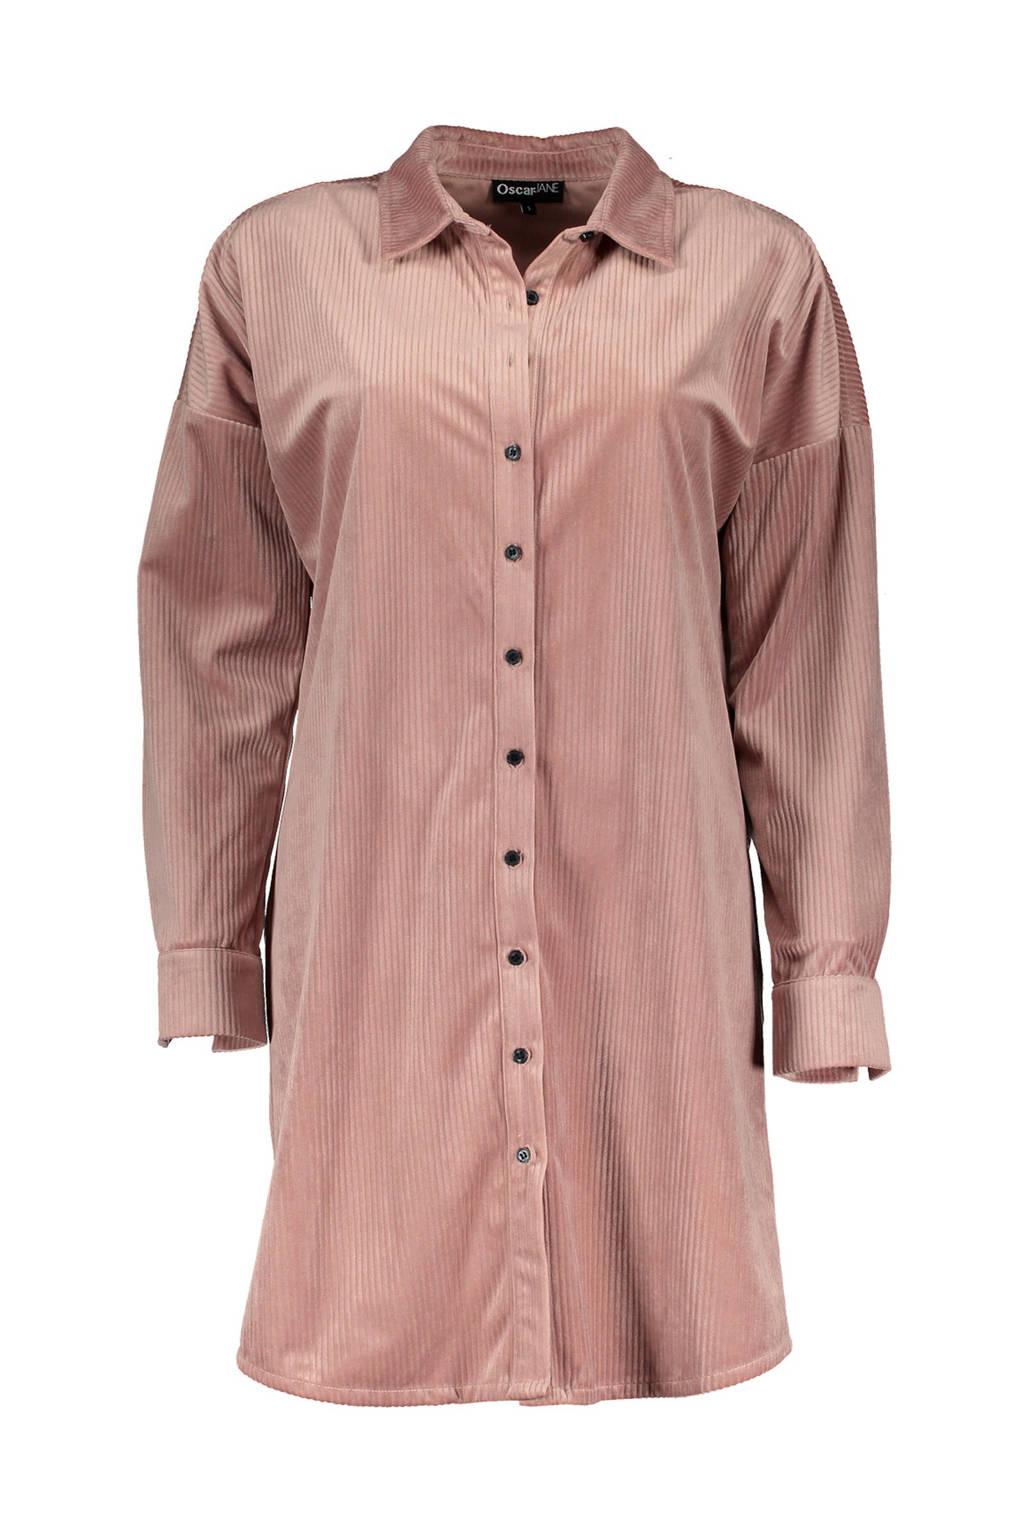 Oscar&Jane corduroy blousejurk Lieke roze, Roze